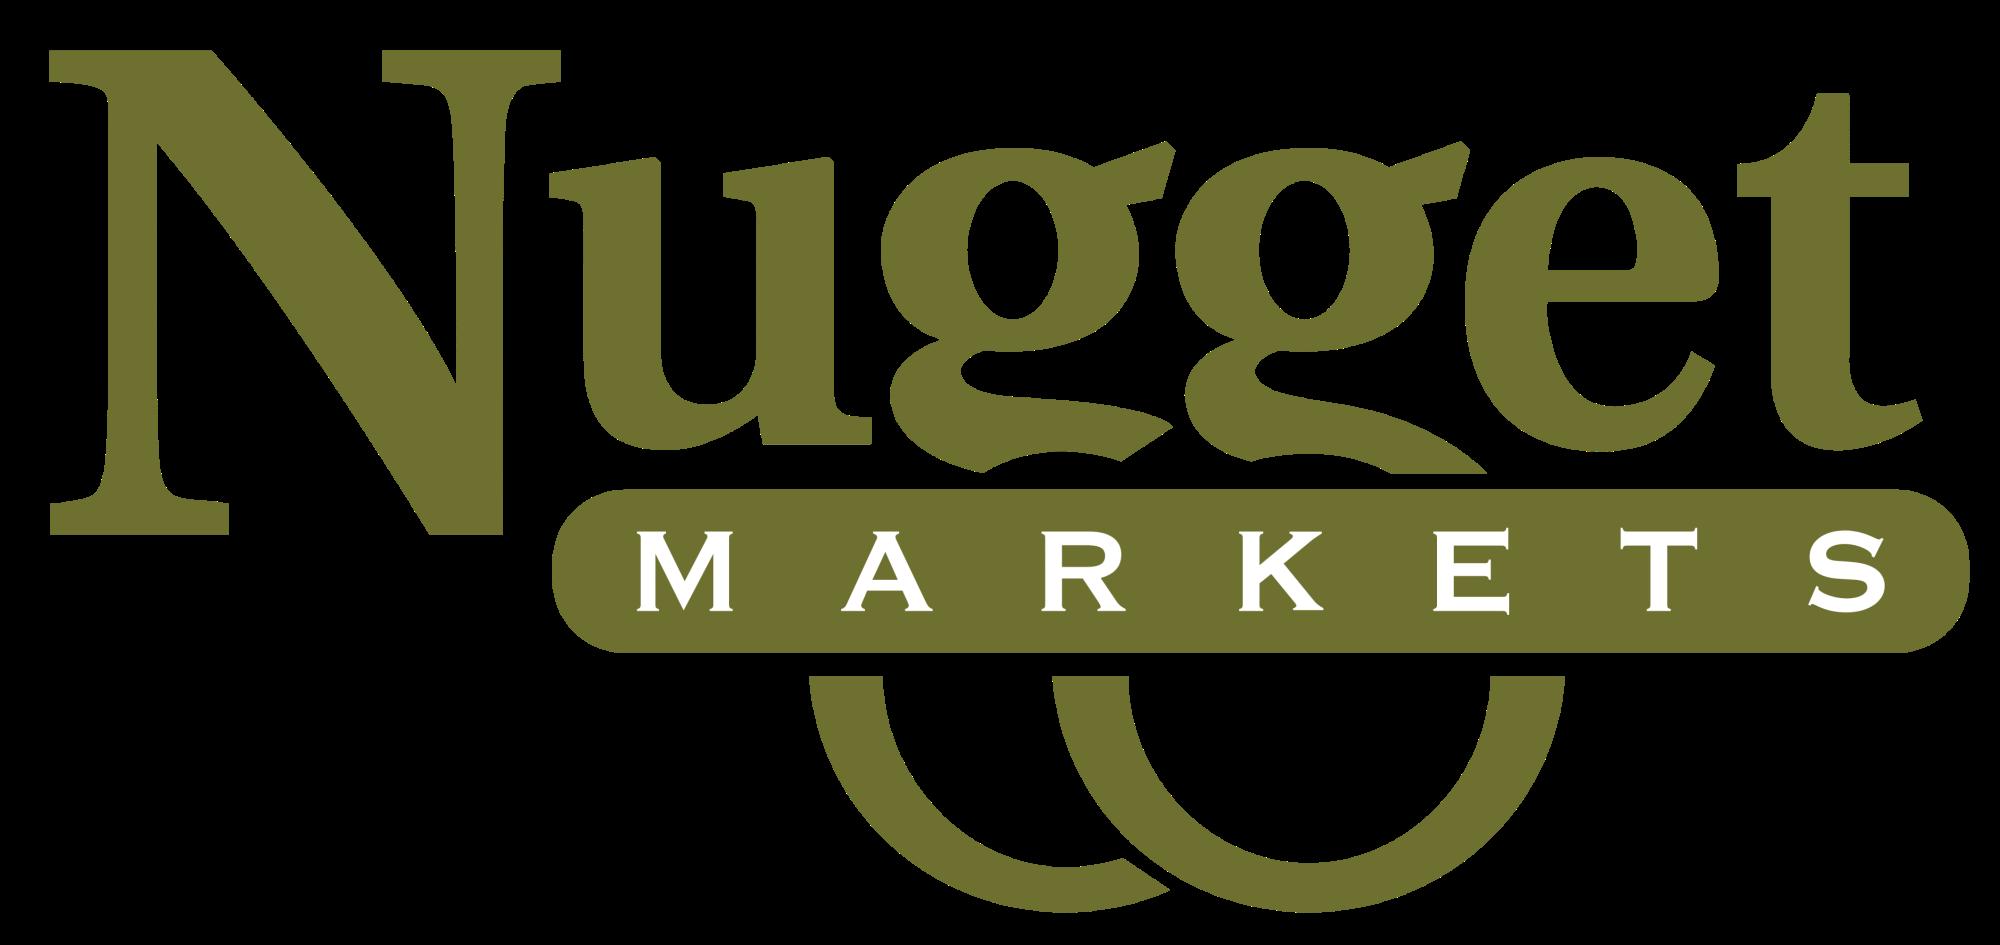 Nugget_Markets_logo